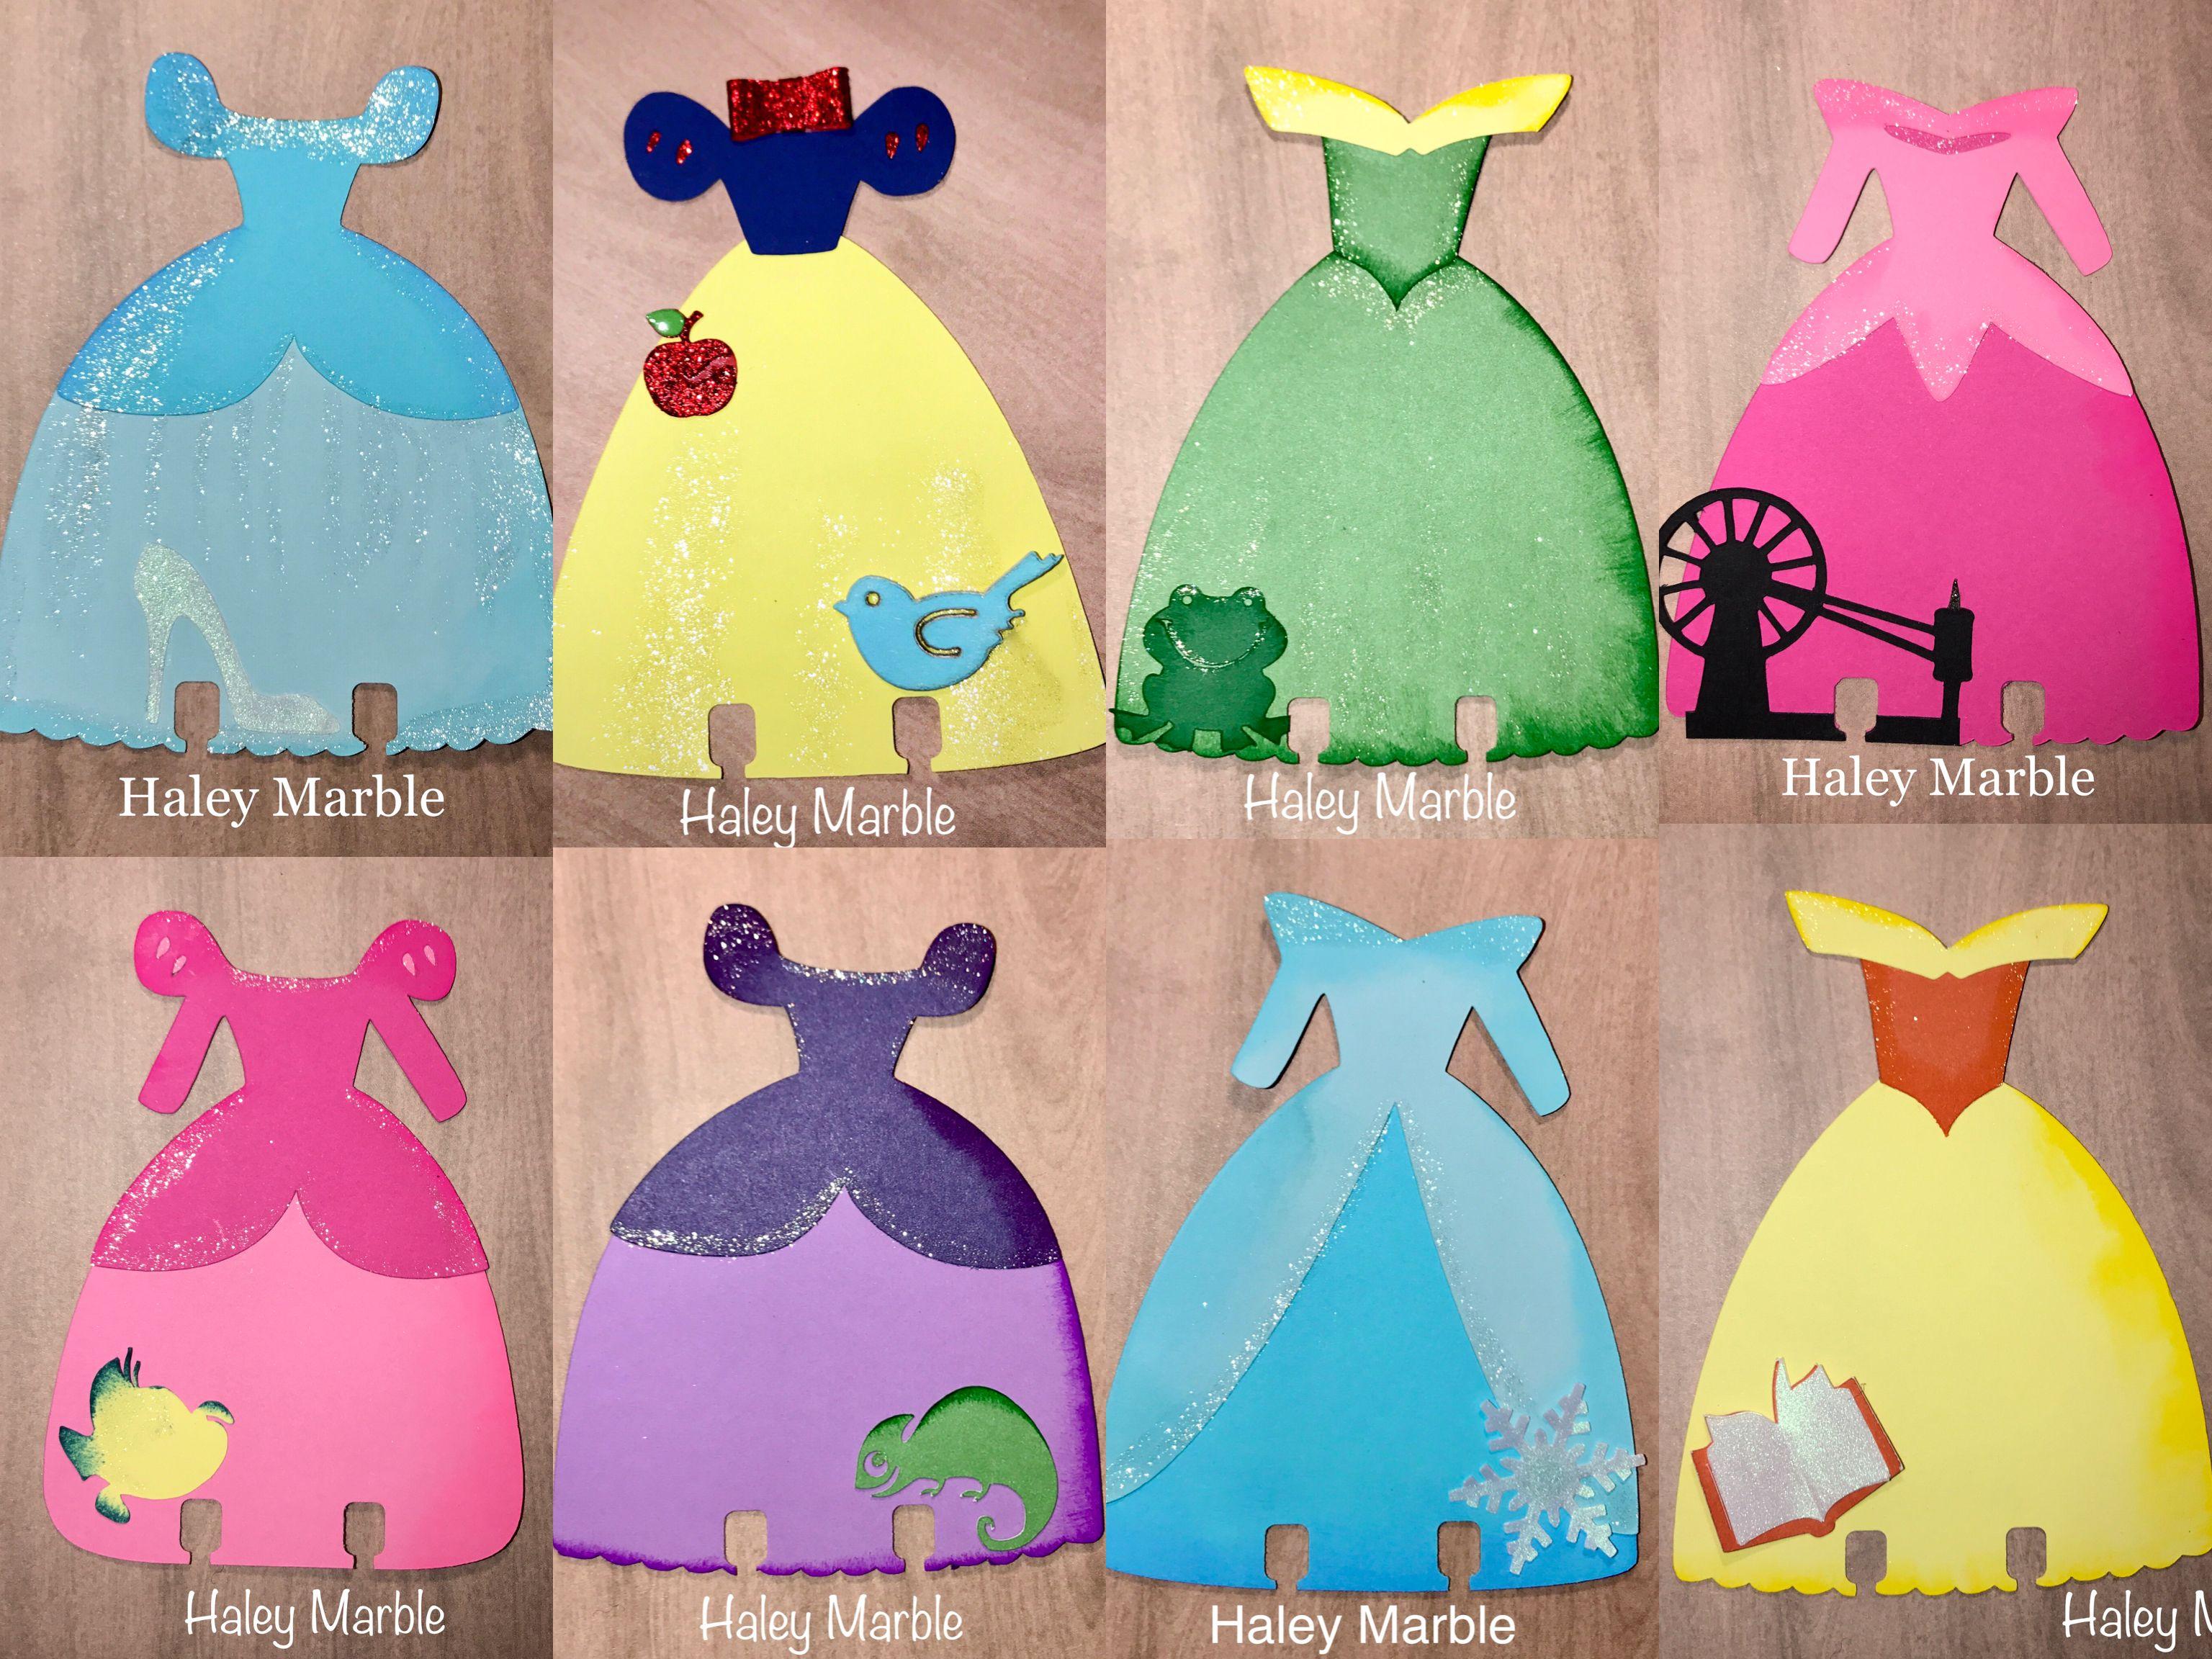 Disney Princess Memory Dex Cards Made By Haley Marble July 2017 Disney Princess Crafts Princess Crafts Disney Princess Party